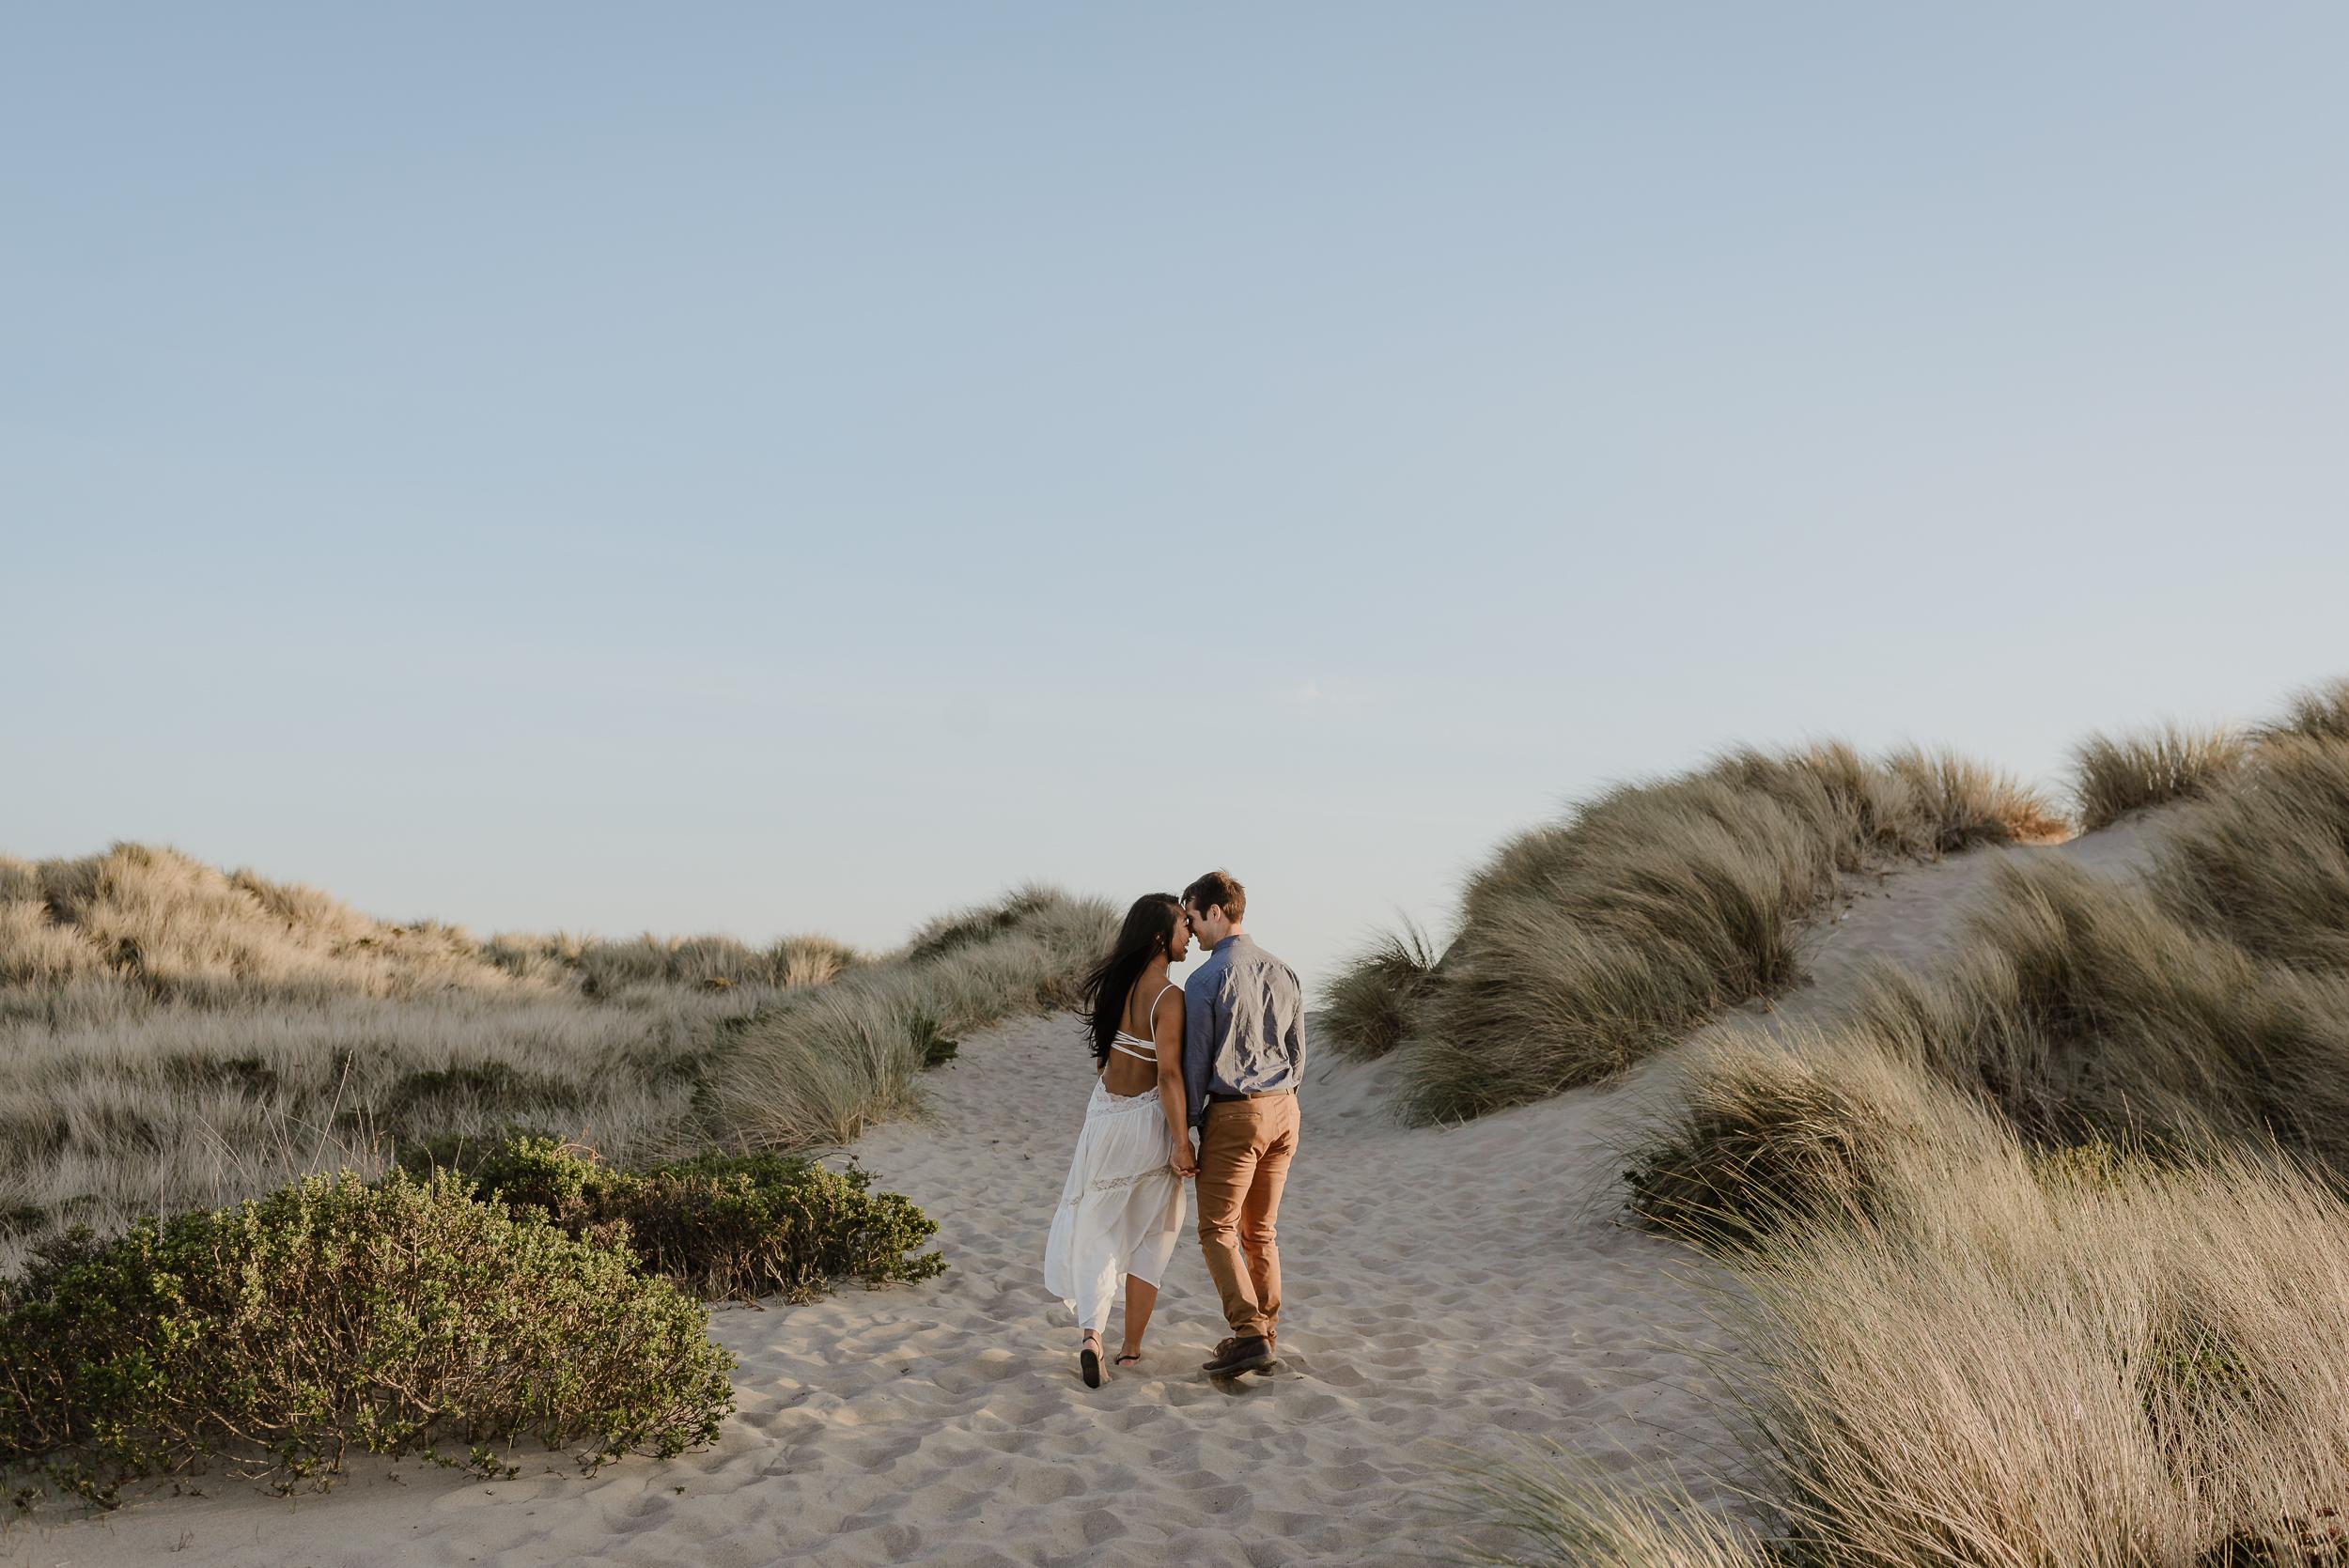 16-point-reyes-national-seashore-engagement-shoot-vivianchen-103.jpg